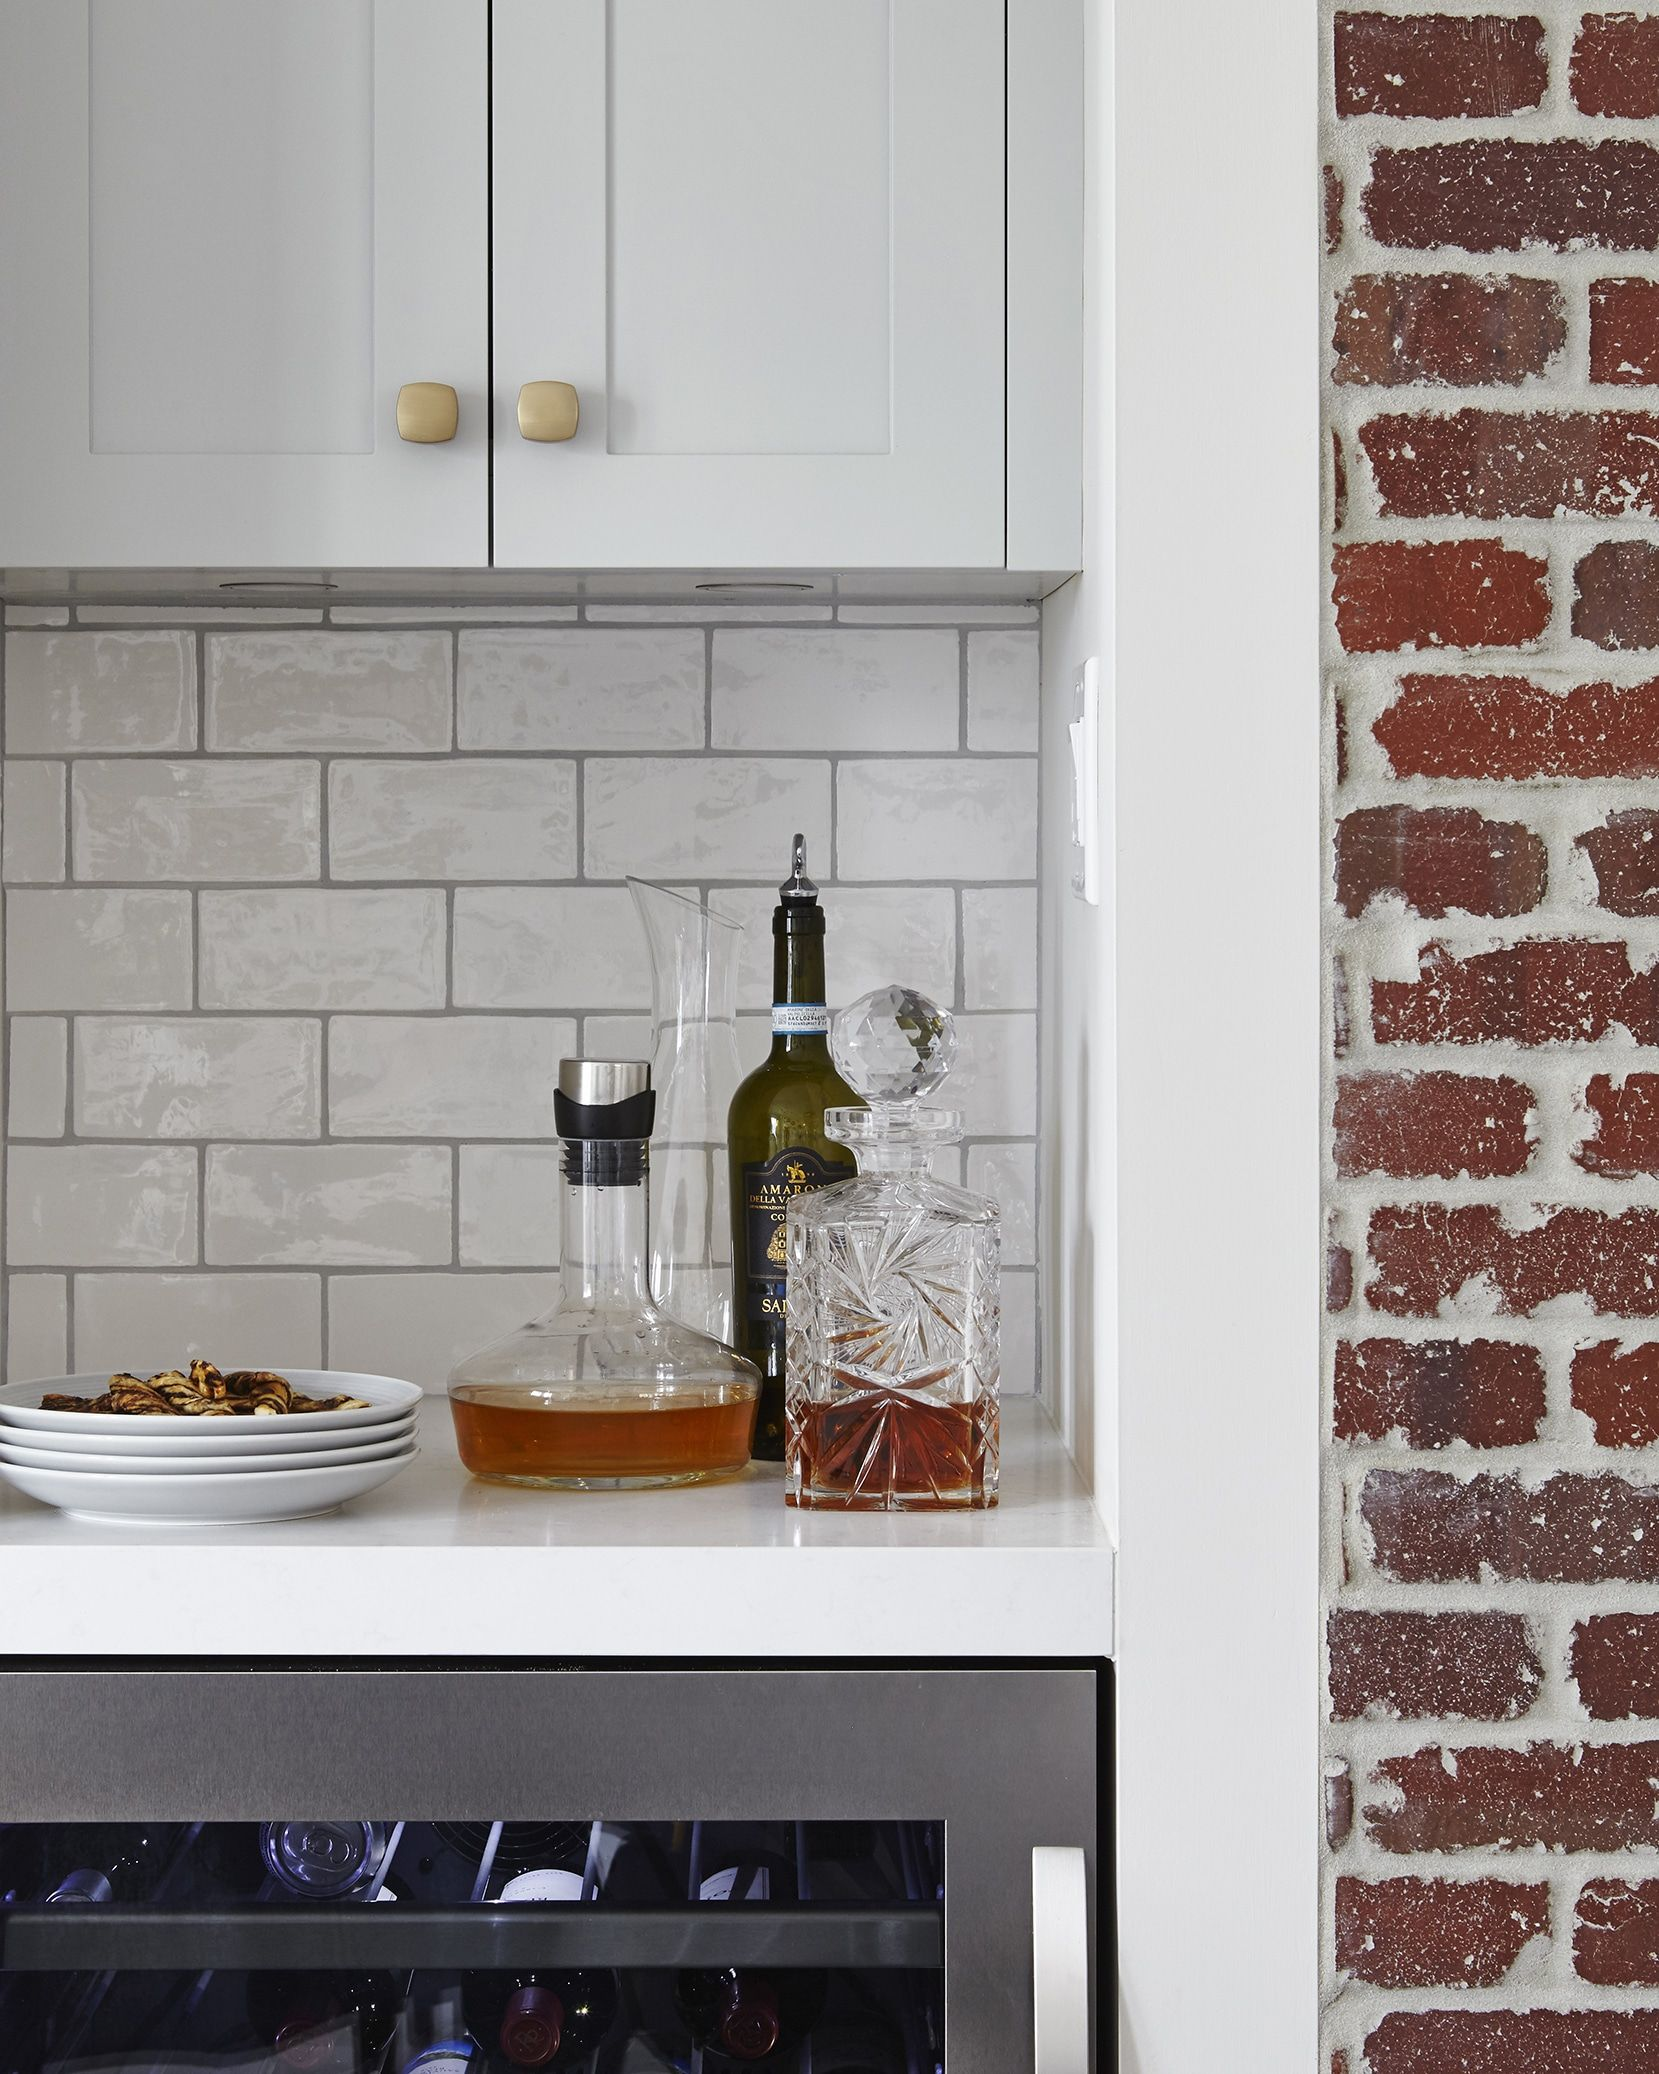 Light Grey Cabinetry Natural Red Brick Walls White Subway Tile Beverage Fridge Orsi Panos Interiors Light Grey Kitchens Grey Kitchen Red Brick Walls